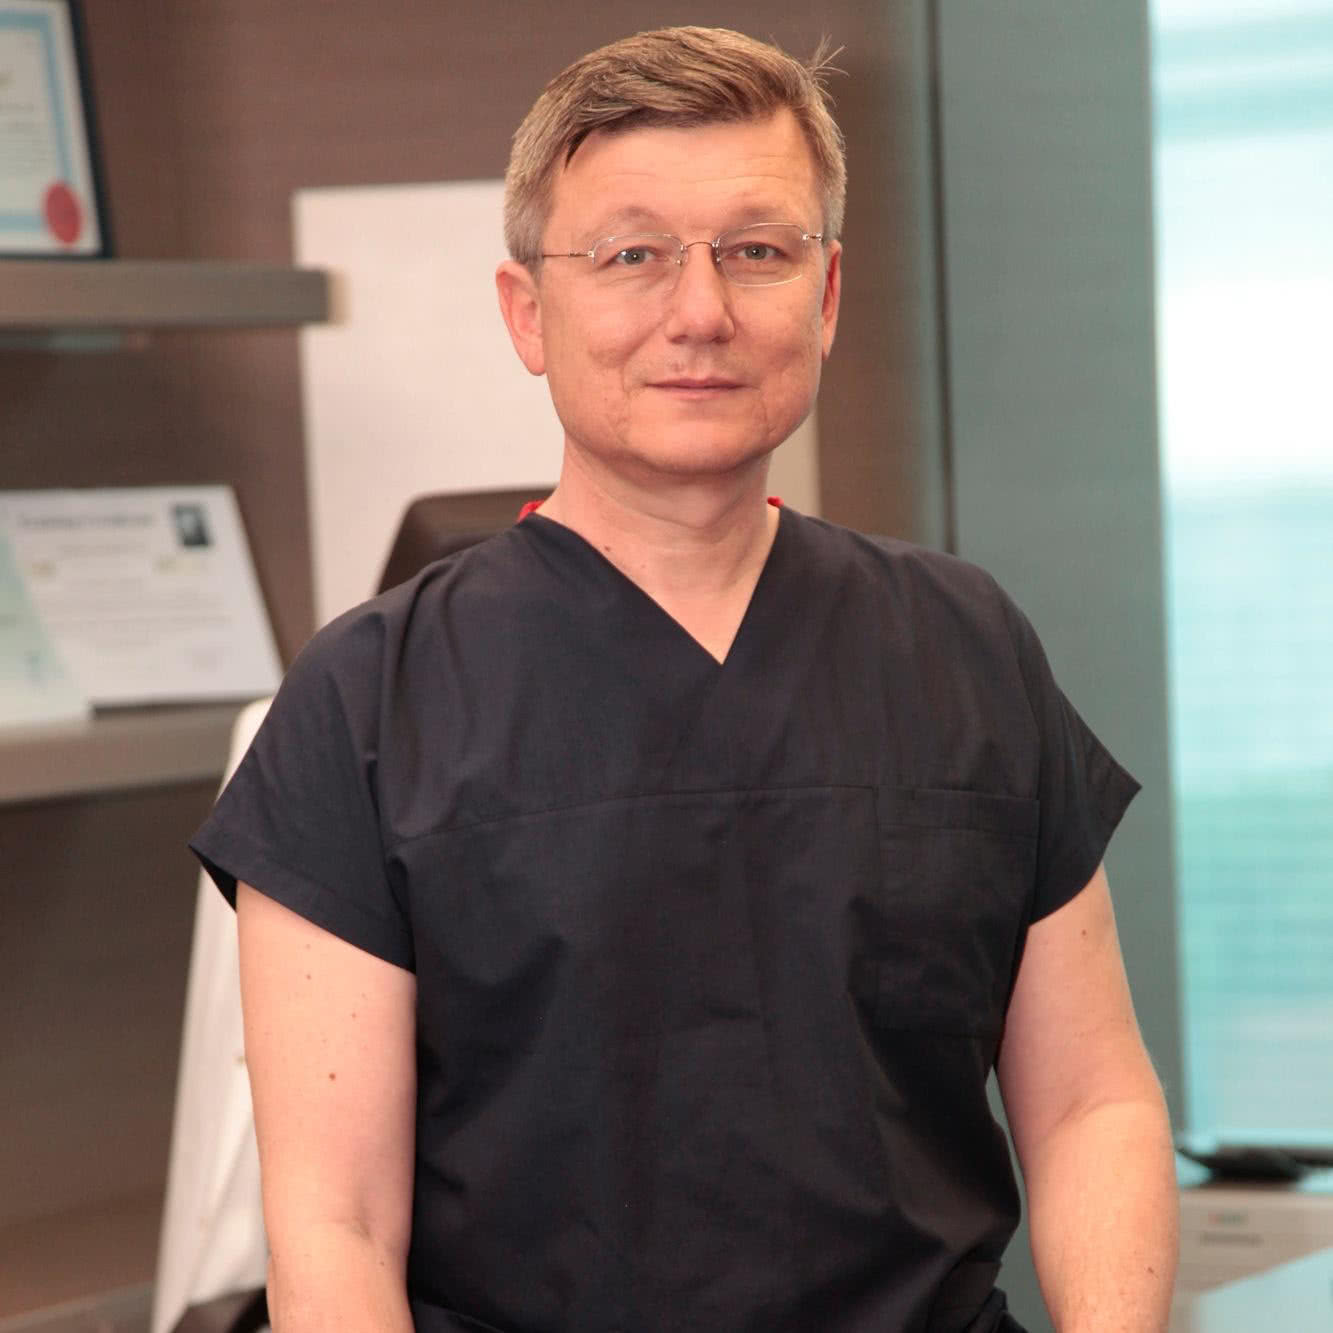 Liv Hospital, Доктор - Урология, онкология - Haluk Akpinar